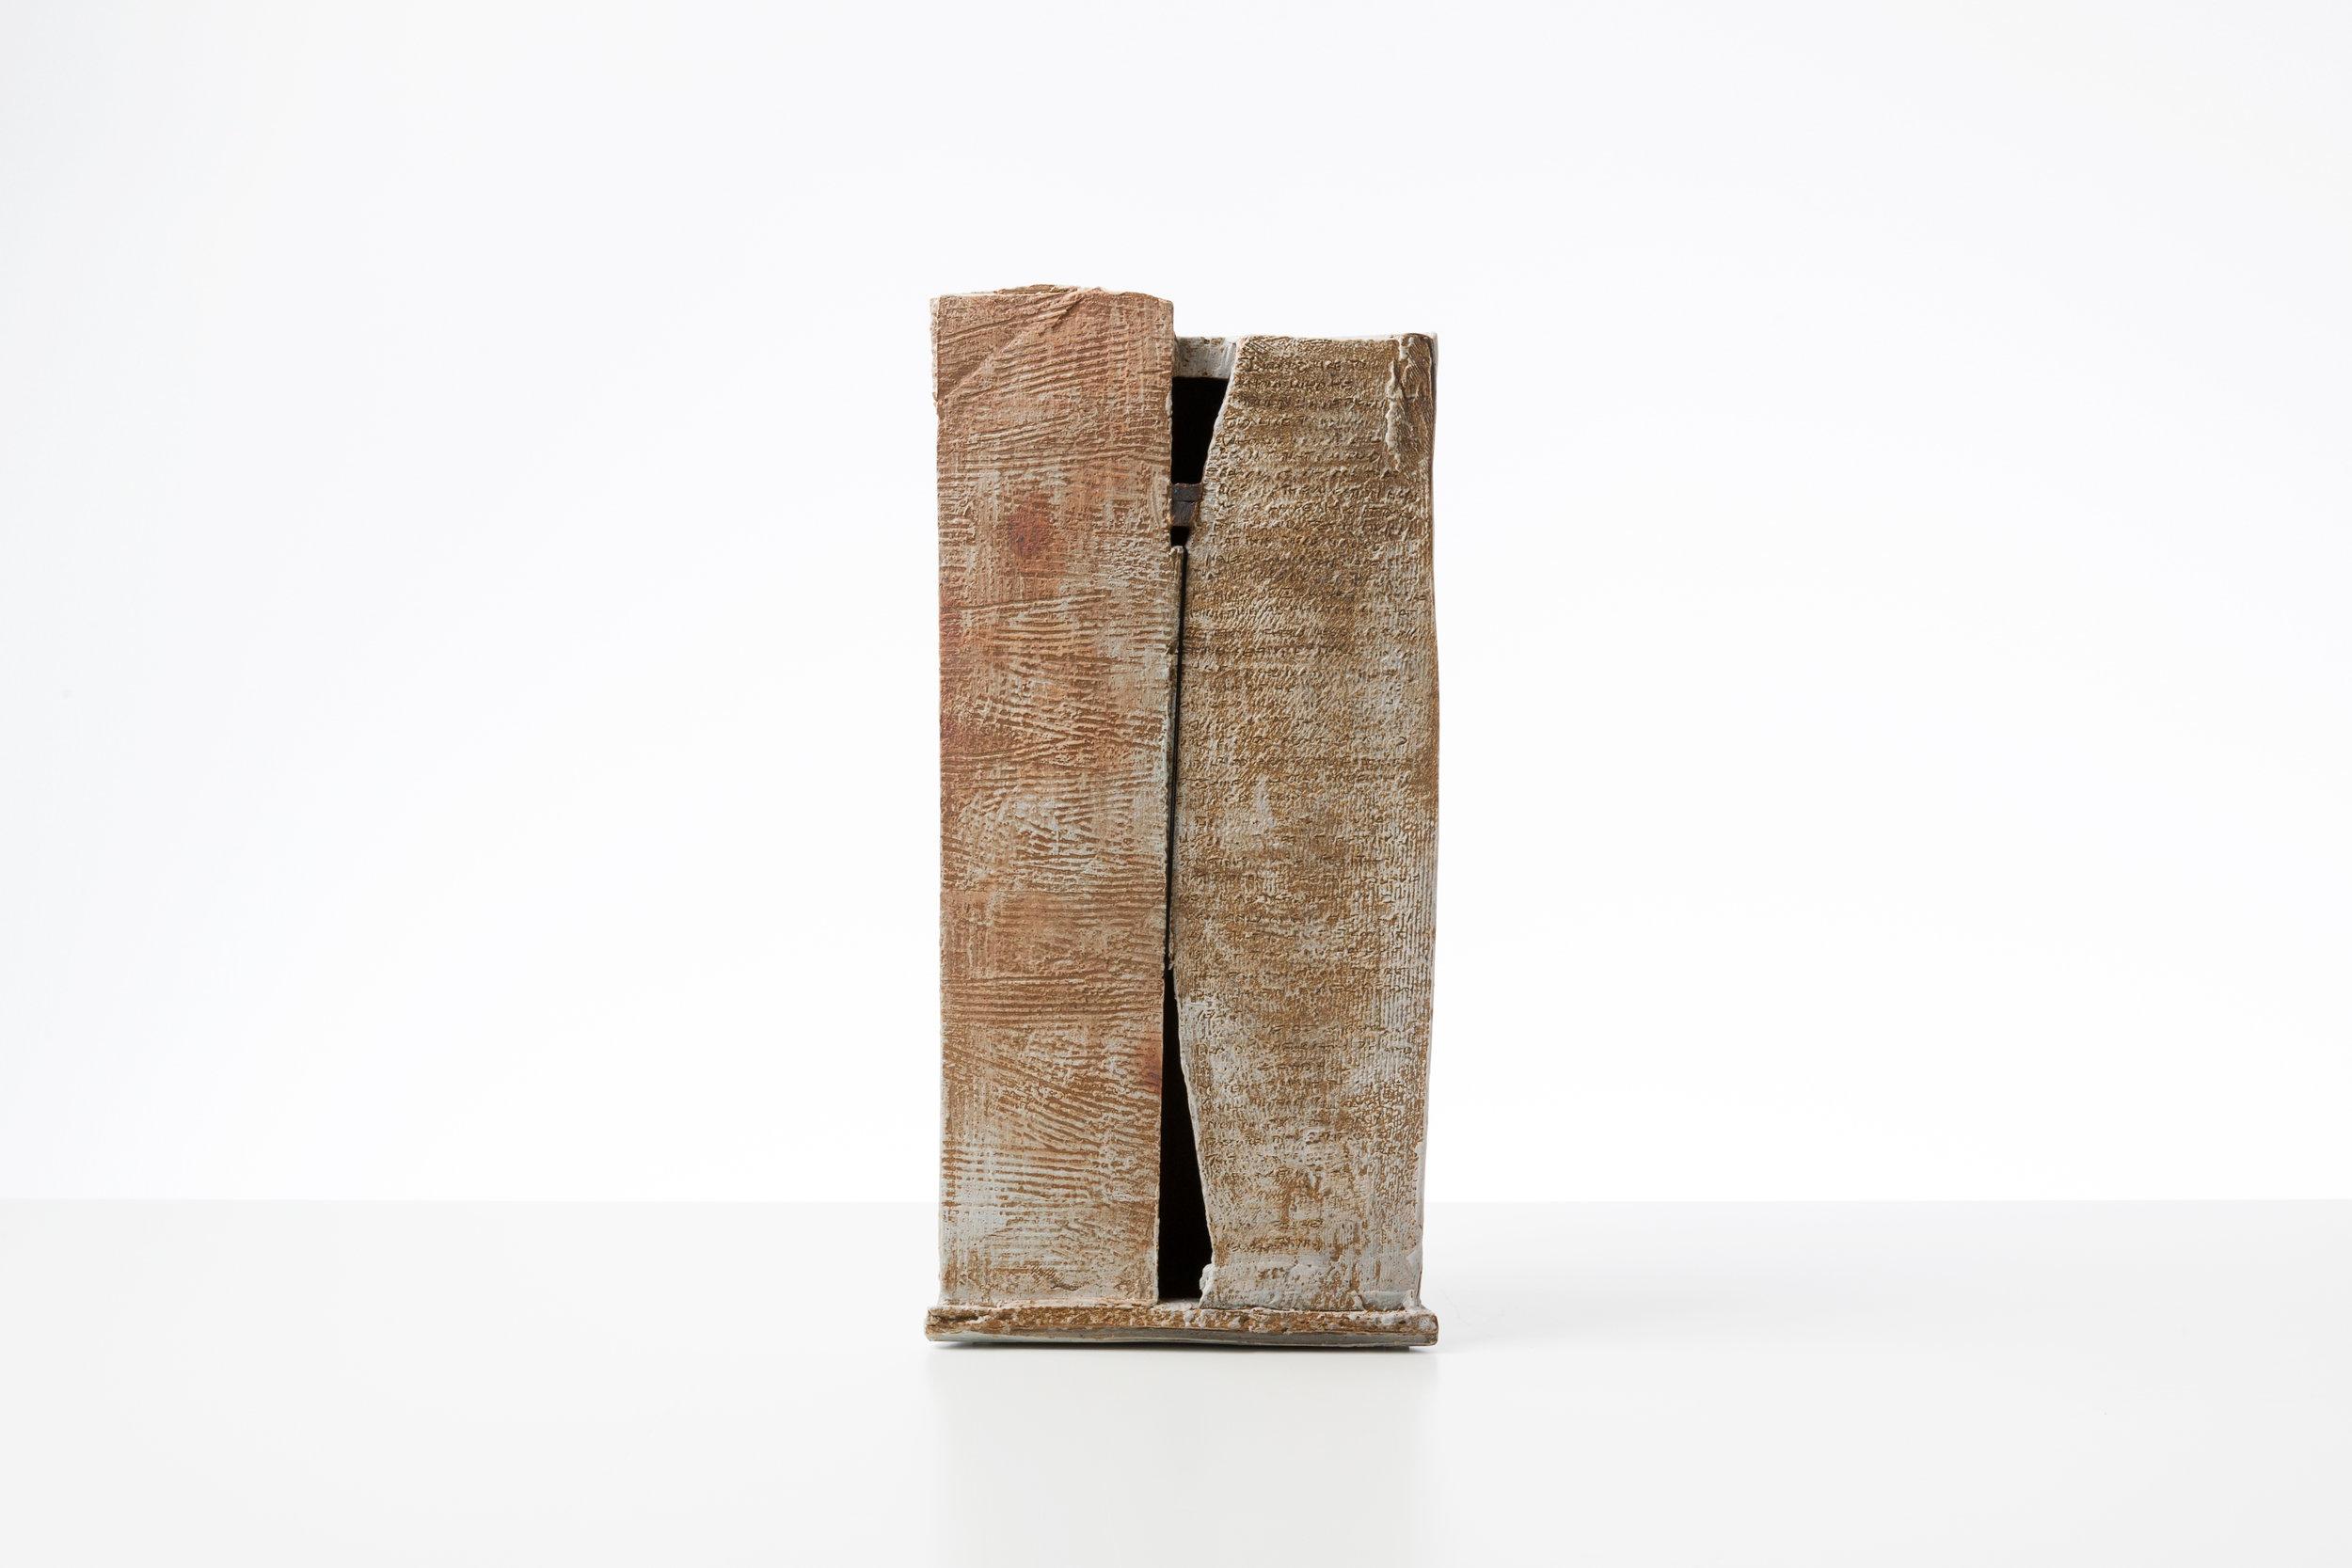 Toni Ross  Stele #21 , 2016 stoneware, slip and cotton thread 18 x 8 3/4 x 5 in.